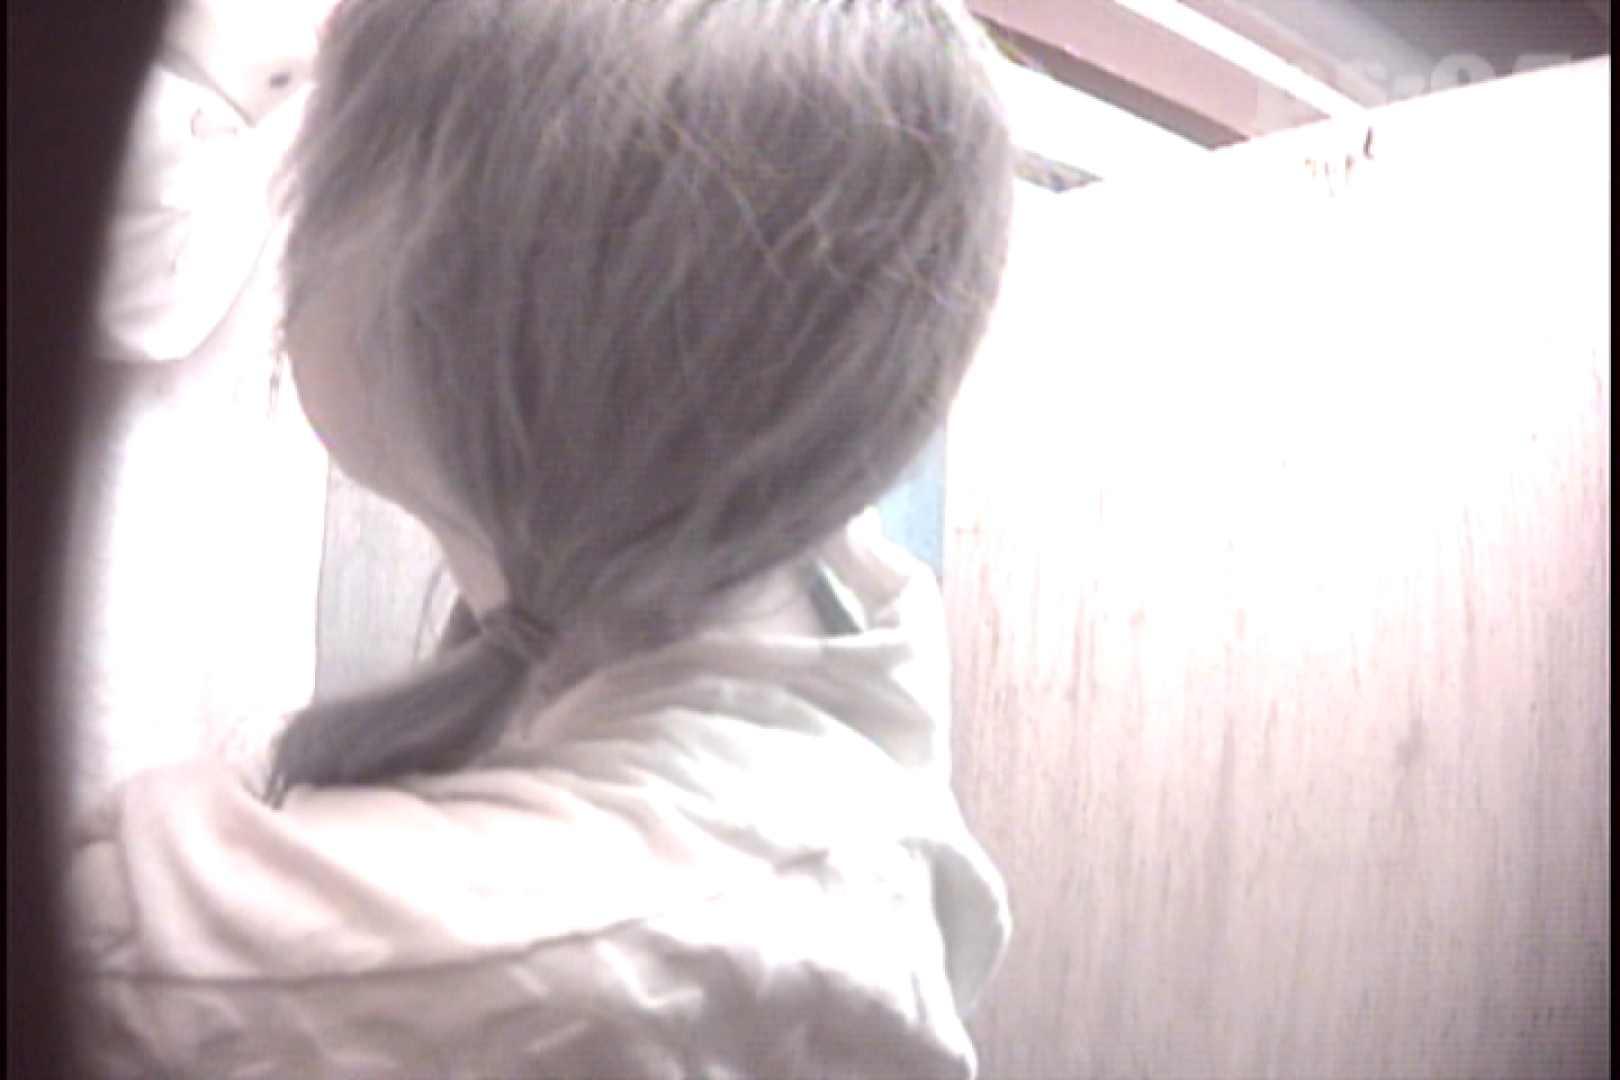 File.37 収穫の秋、こんなの取れました。必見です!【2011年20位】 脱衣所 盗撮ワレメ無修正動画無料 23pic 5